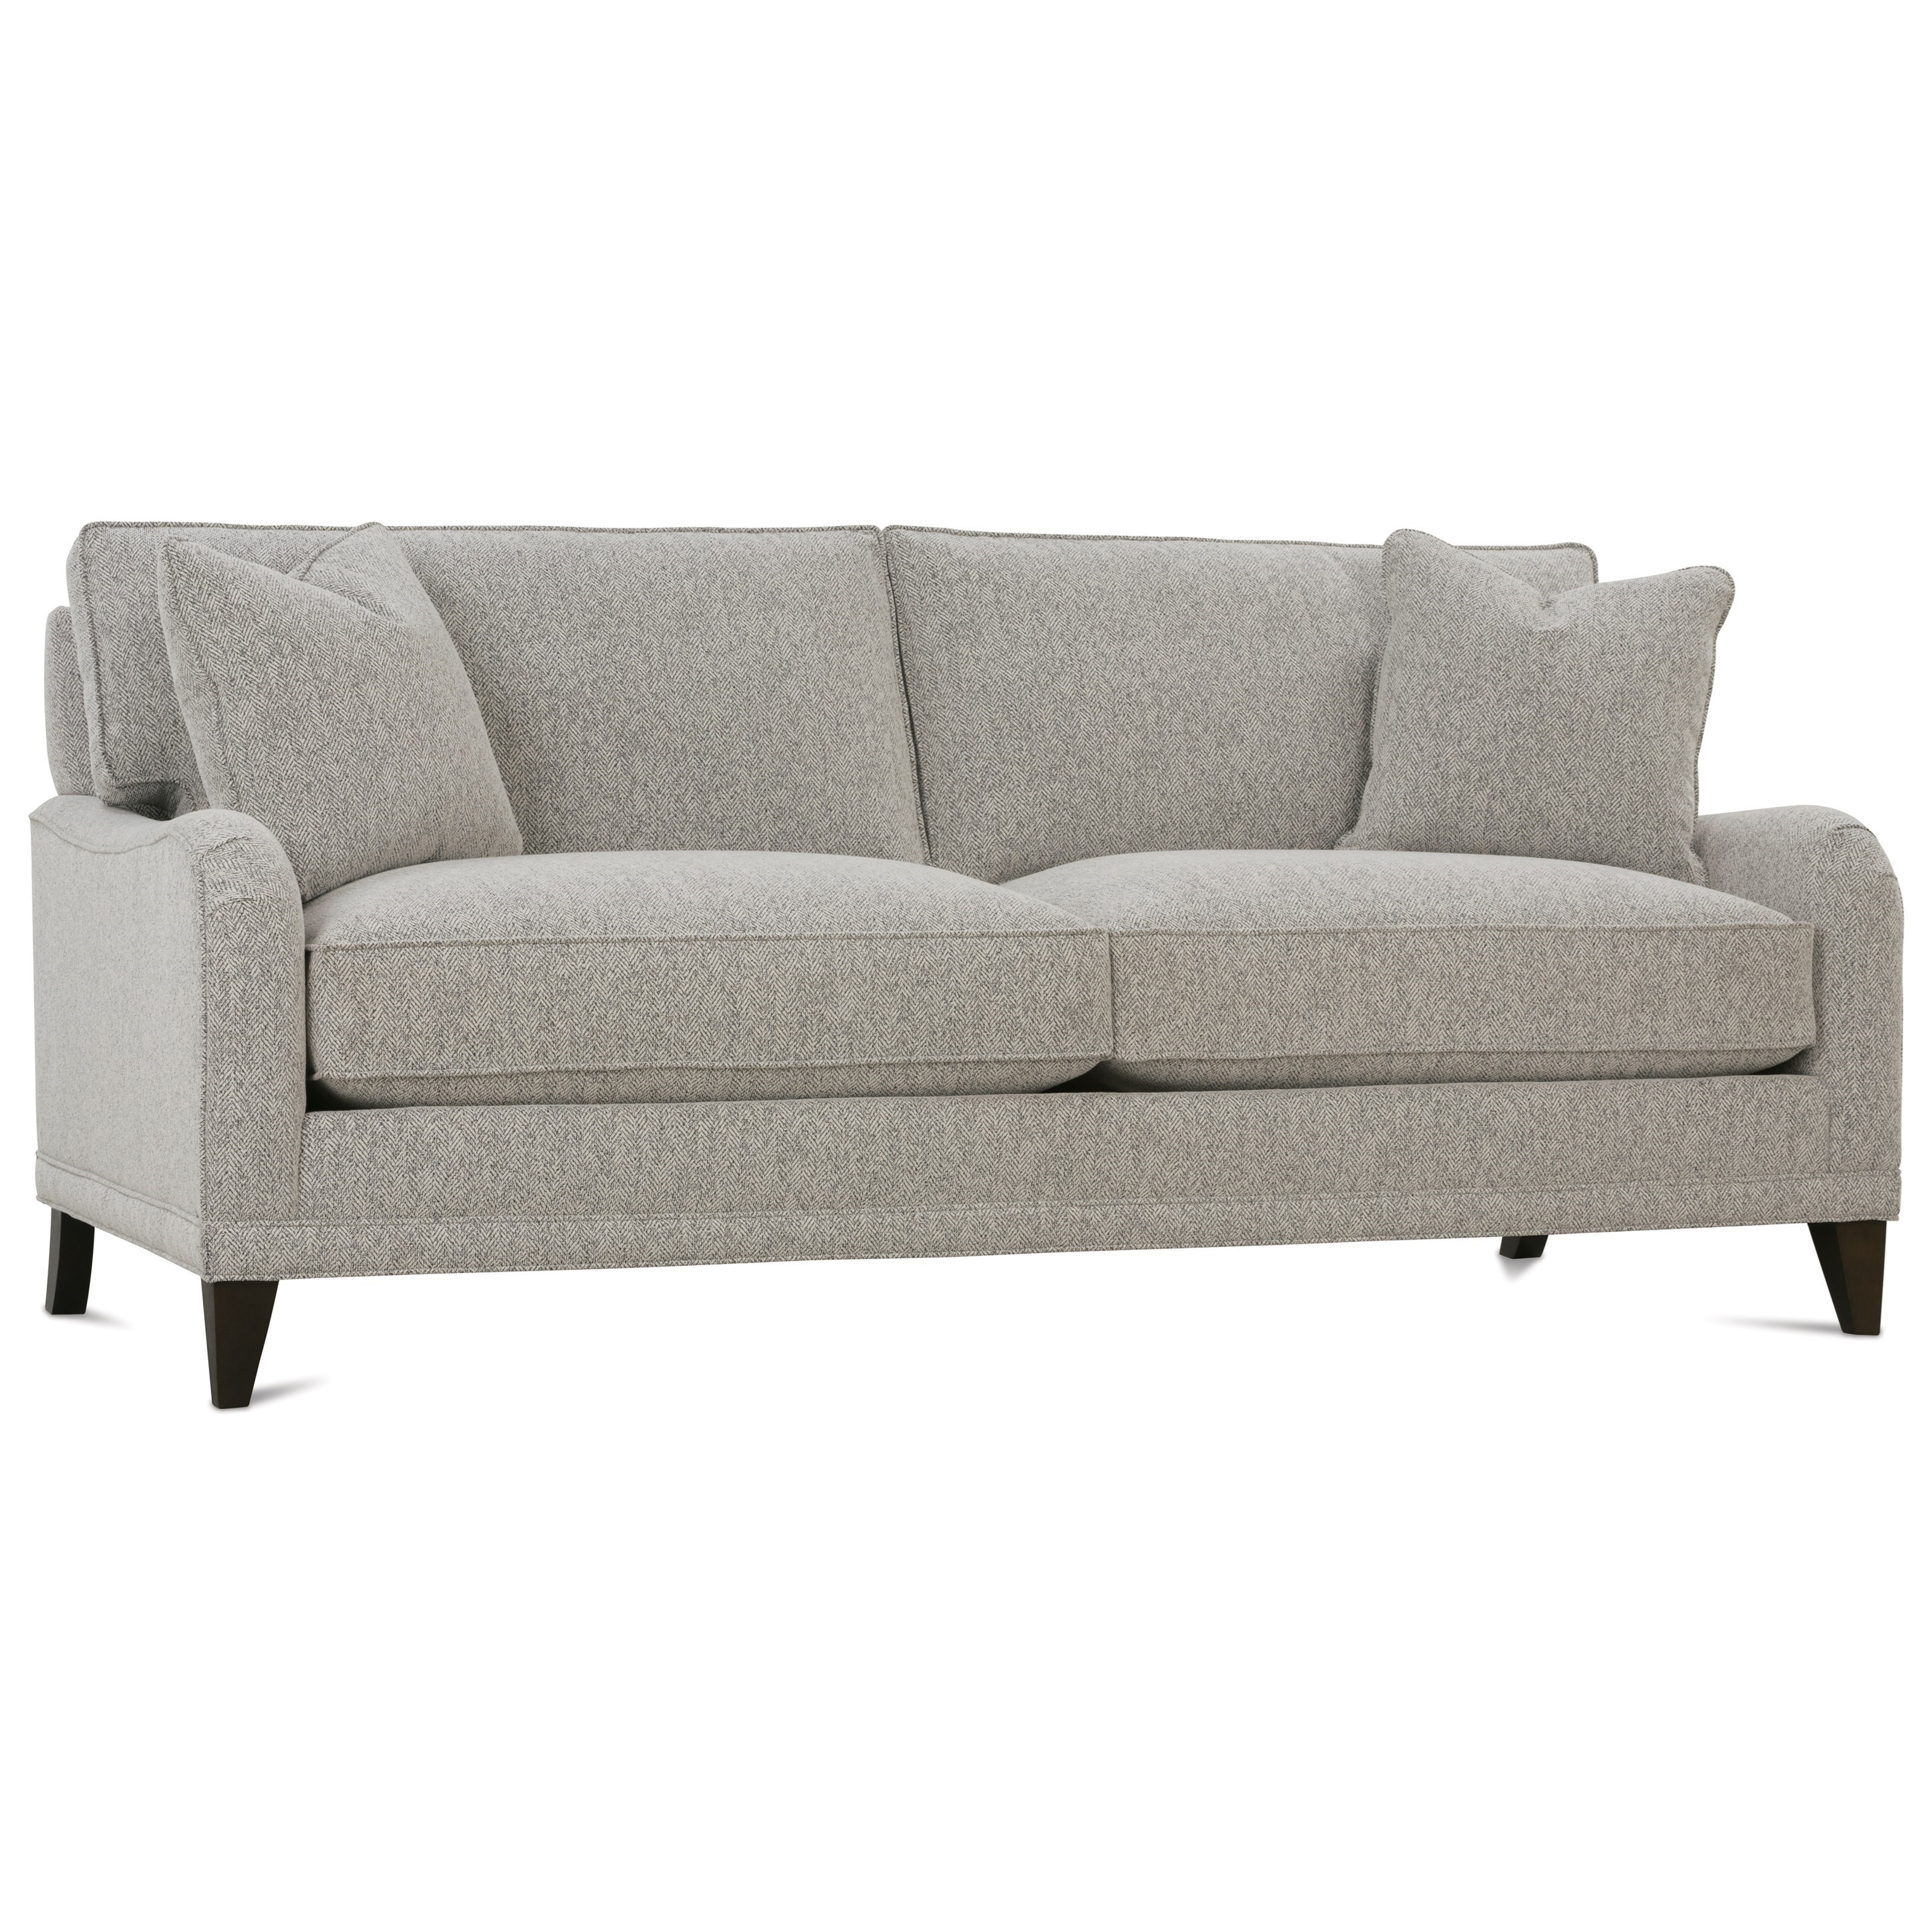 Rowe my style ii ae200 b 021 customizable 2 seat sofa with for Box type sofa designs